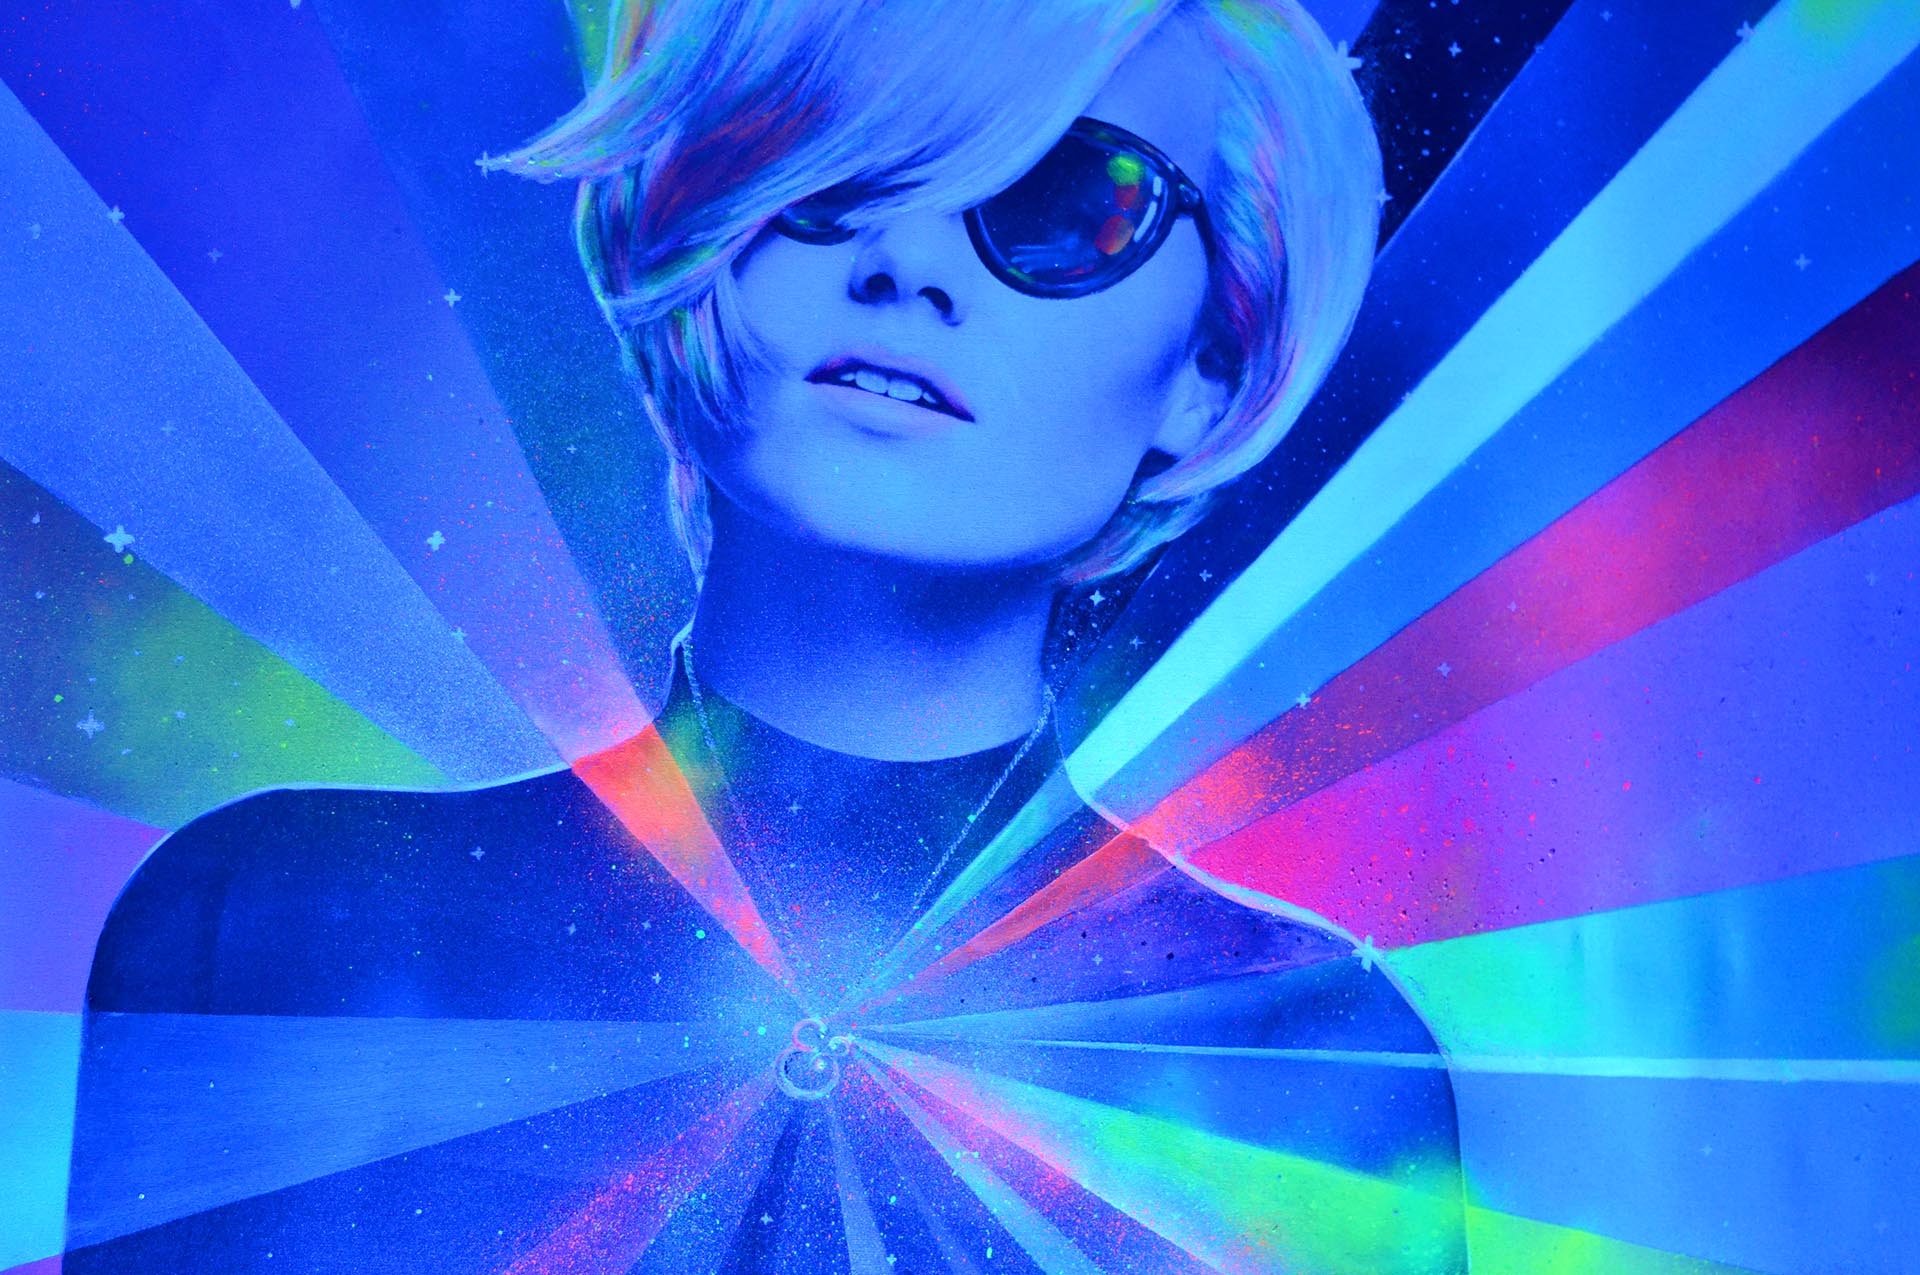 Neon Lady by Eduardo Morales - bajo la luz azul (detalle)